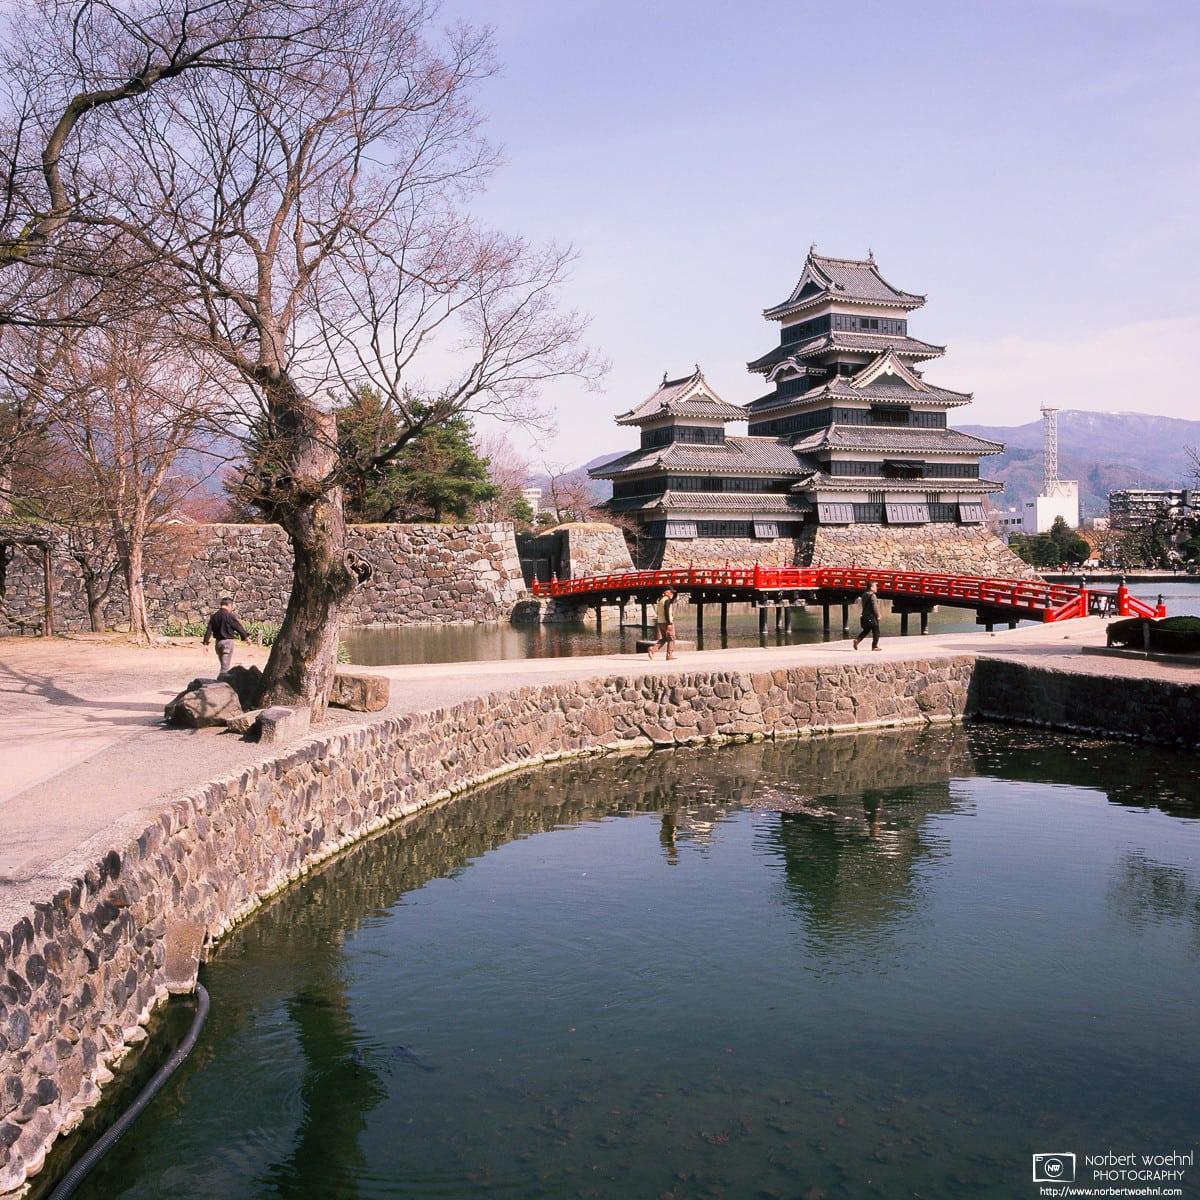 Castle in the City, Matsumoto, Japan Photo